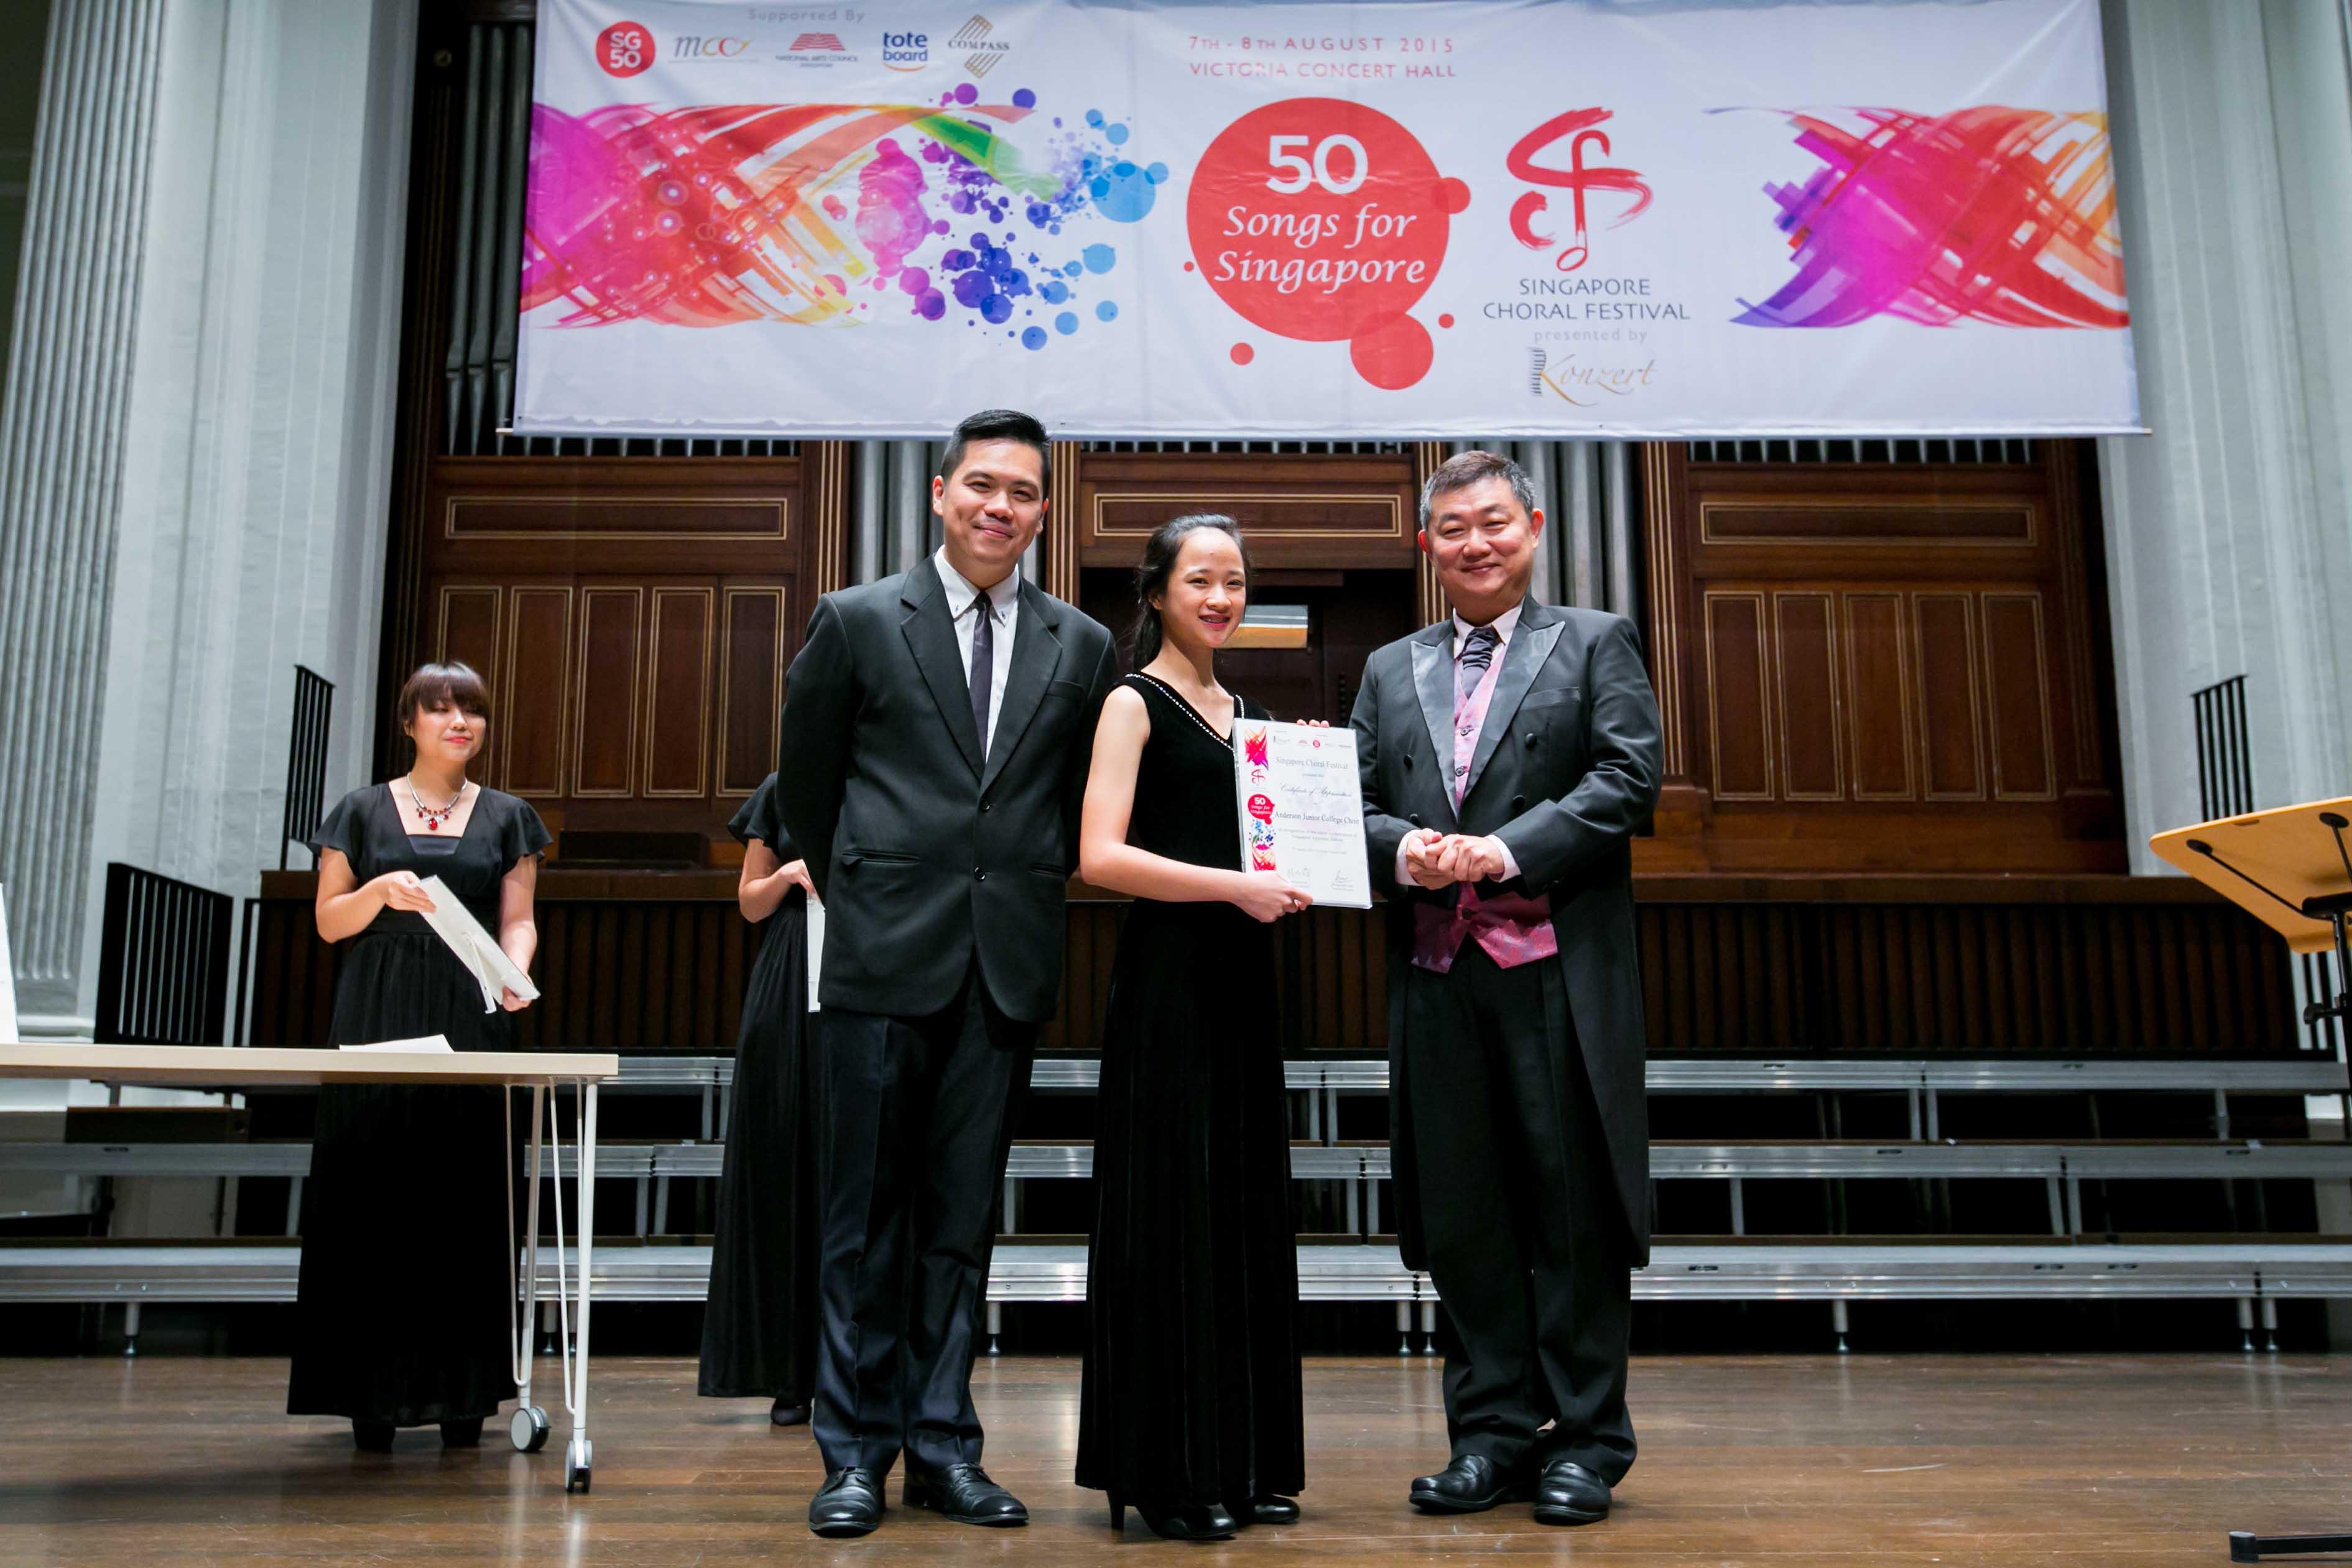 Singapore Choral Festival 7-8-15 (213).jpg